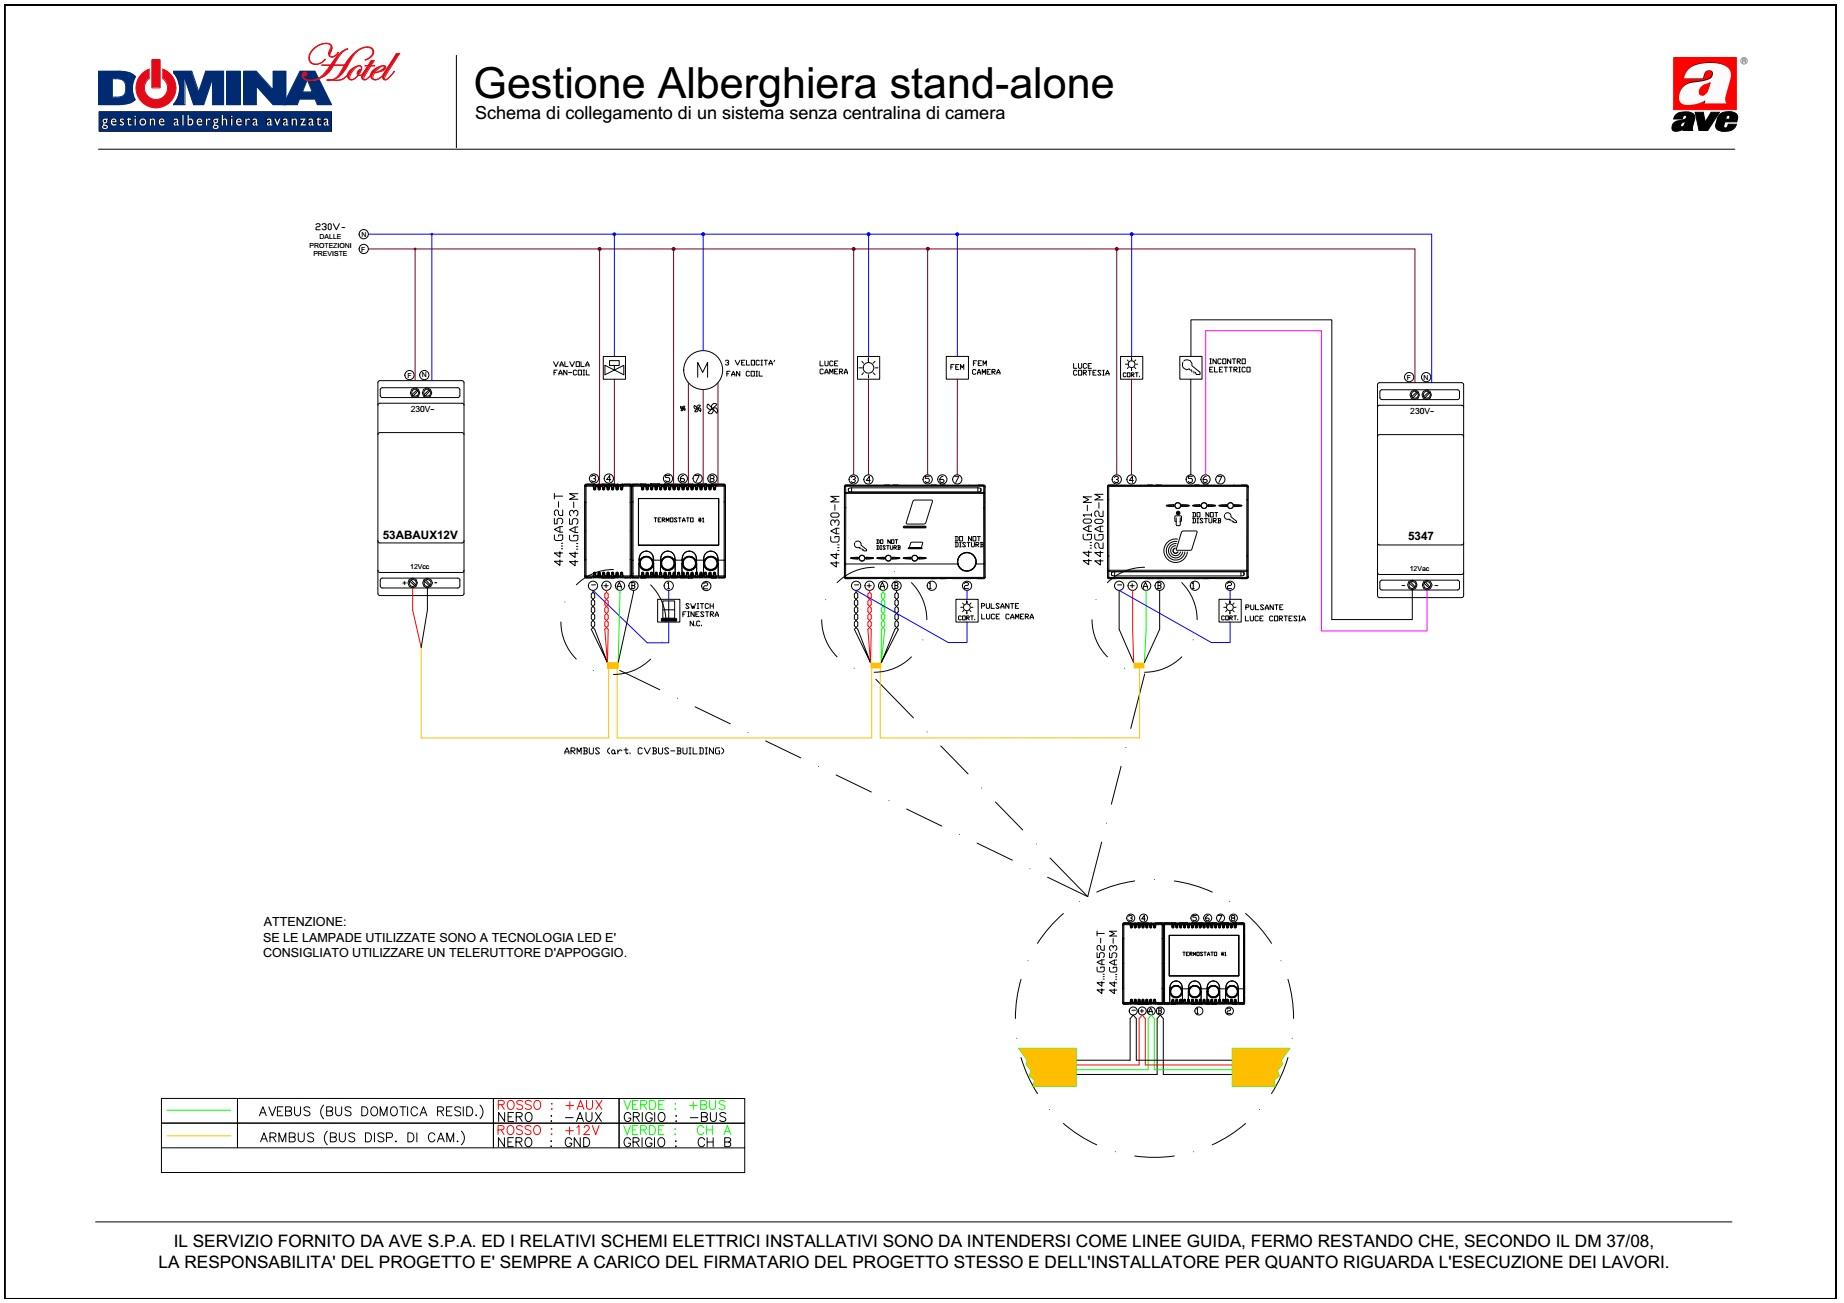 Gestione Alberghiera stand-alone - sistema senza centralina di camera